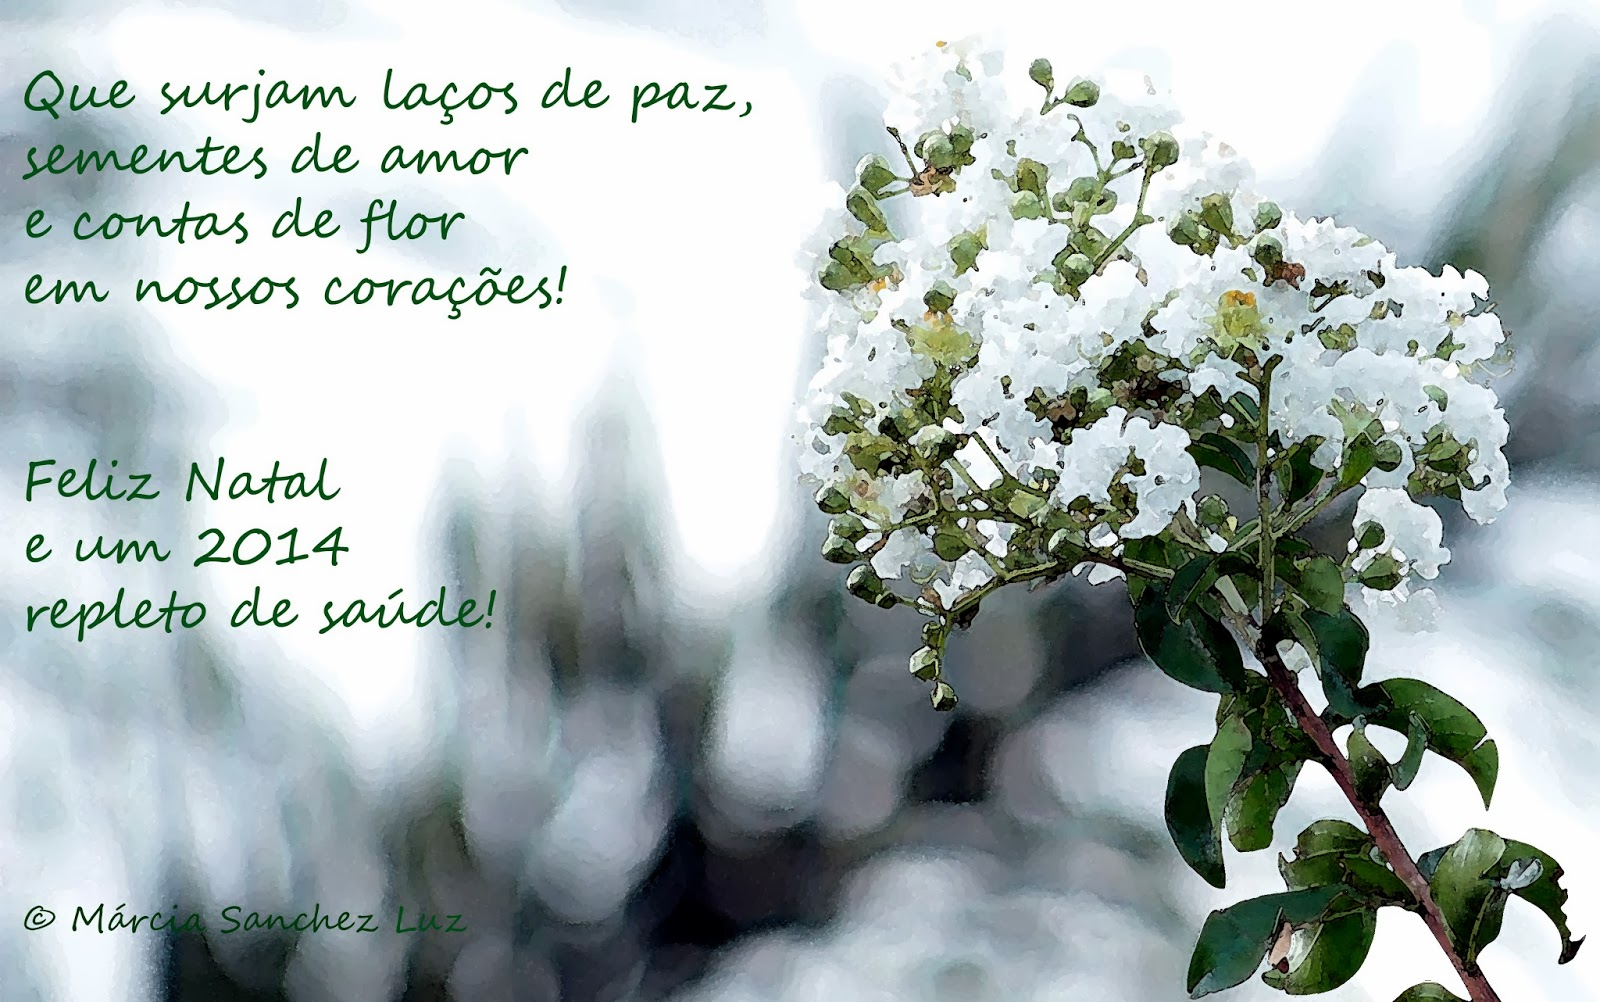 Imagem e texto de Márcia Sanchez Luz